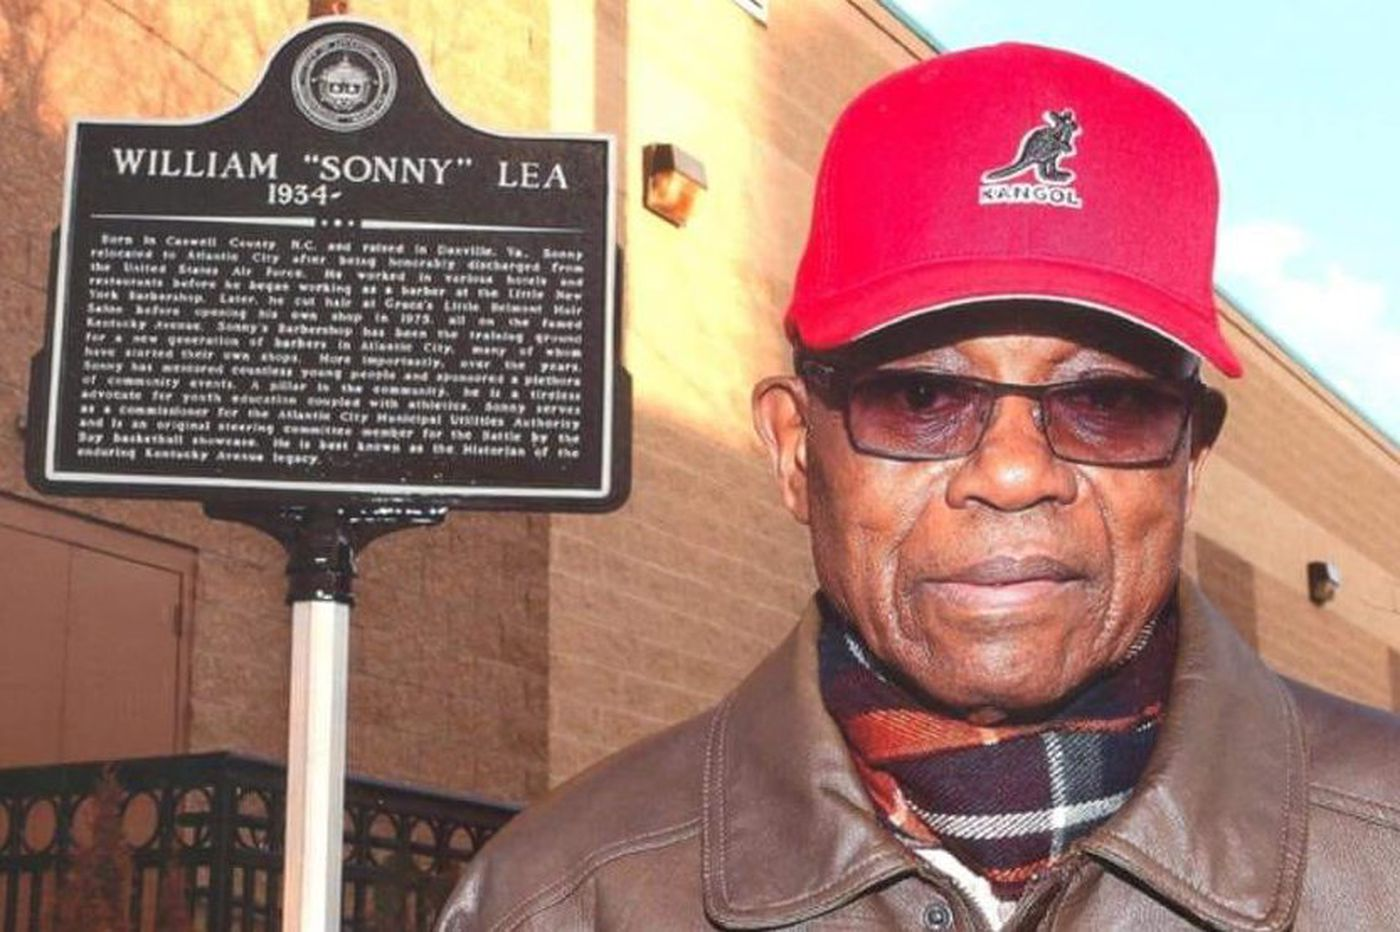 William 'Sonny' Lea, 83, iconic Atlantic City barber who mentored children